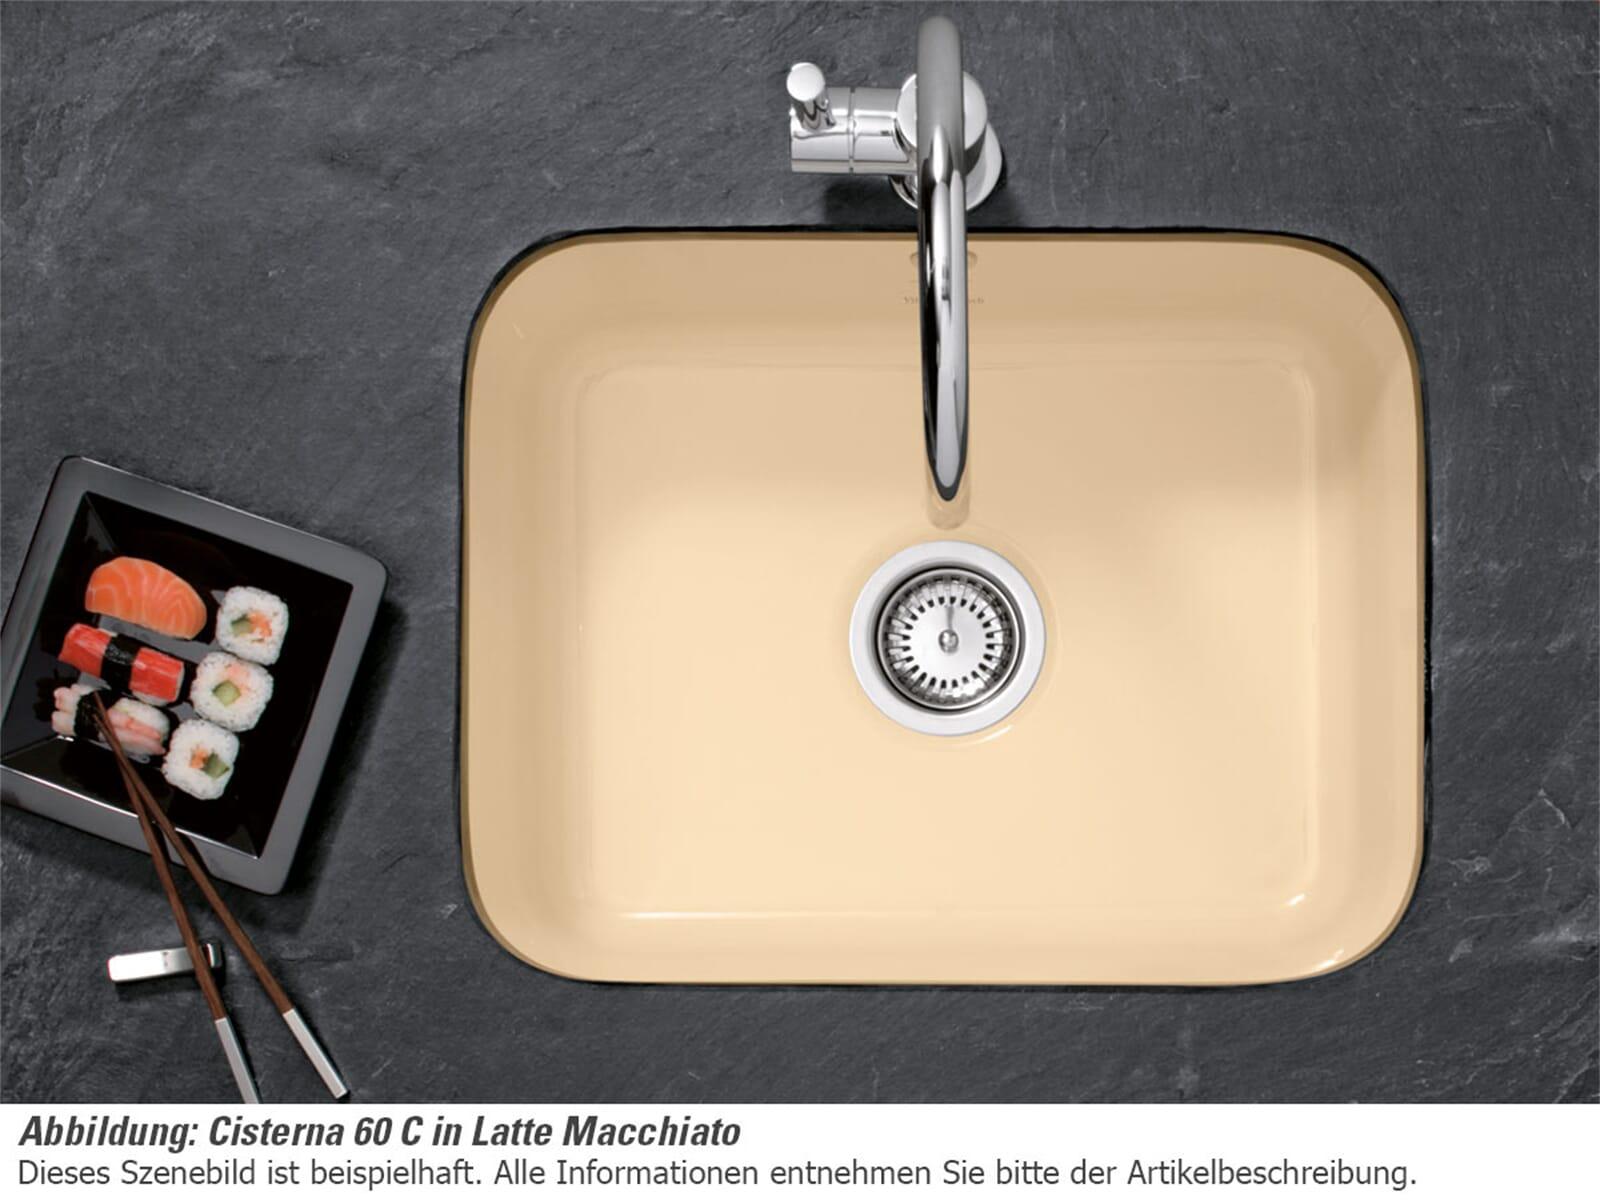 villeroy boch cisterna 60c fossil keramik sp le. Black Bedroom Furniture Sets. Home Design Ideas